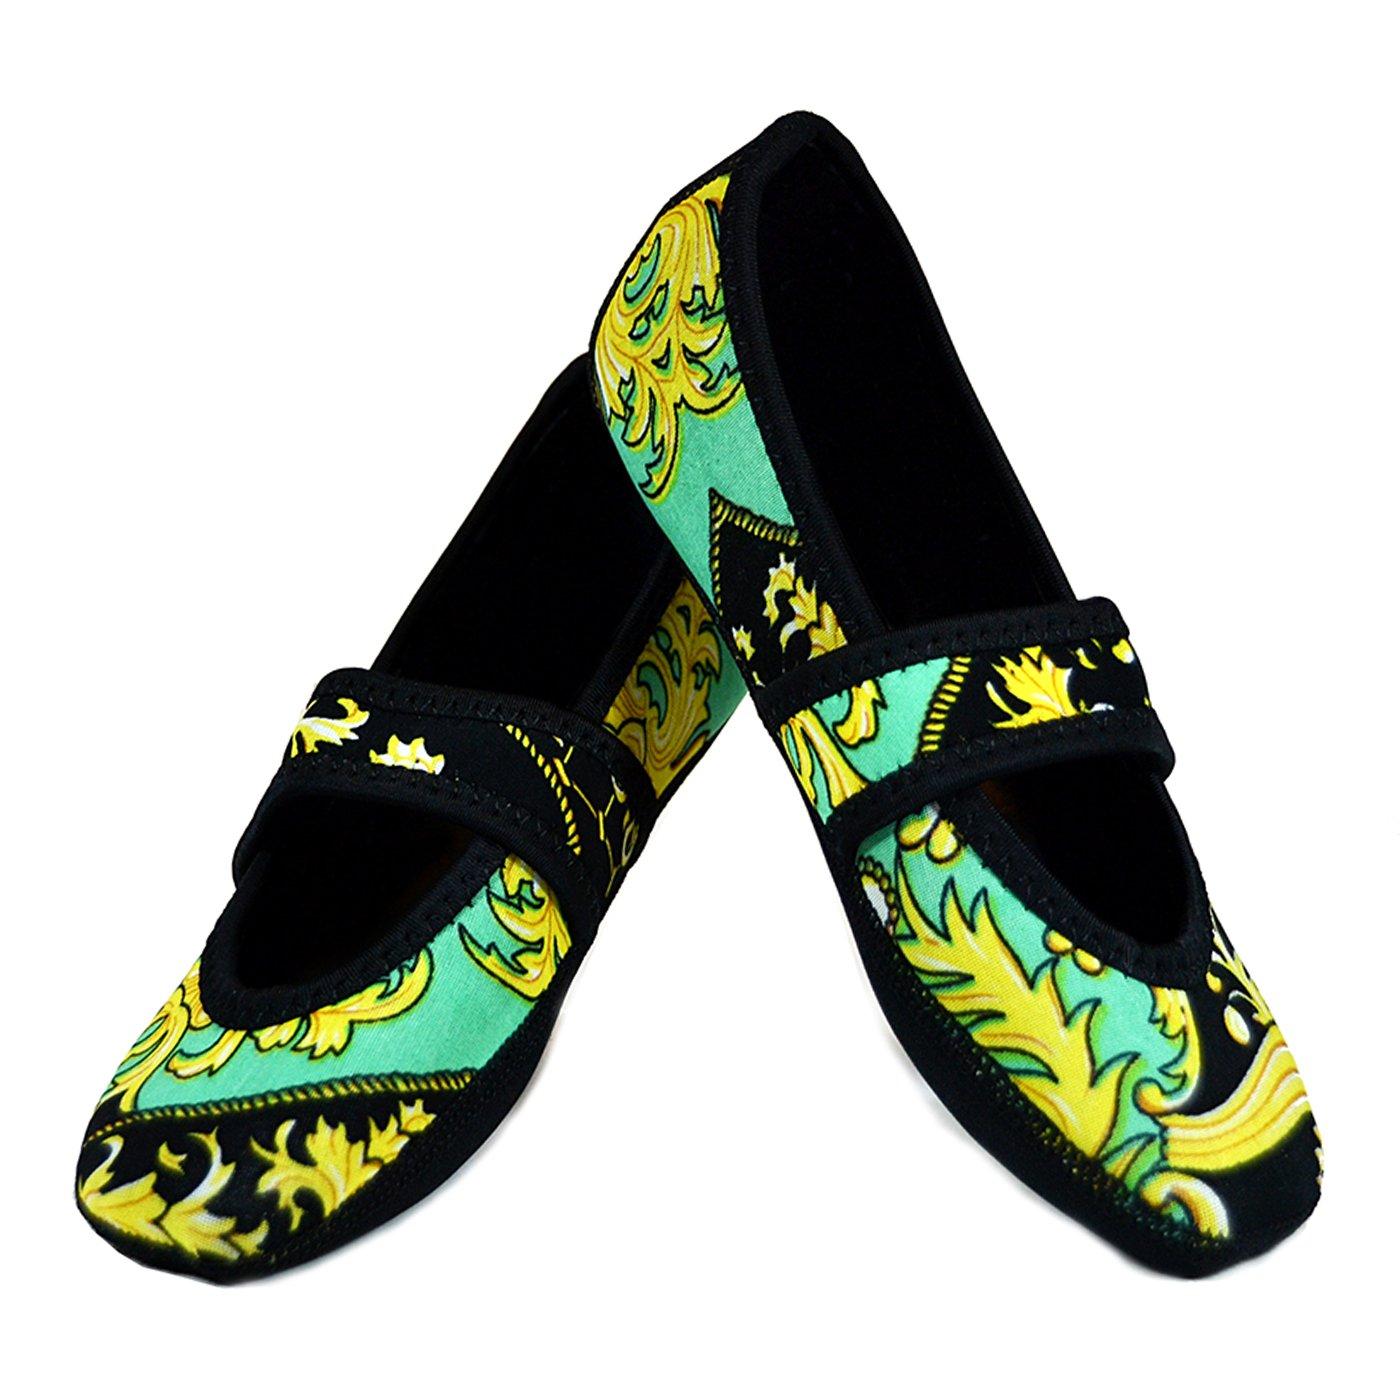 Nufoot Betsy Lou Women's Shoes, Best Foldable & Flexible Flats, Slipper Socks, Travel Slippers & Exercise Shoes, Dance Shoes, Yoga Socks, House Shoes, Indoor Slippers, Green Baroque, Large